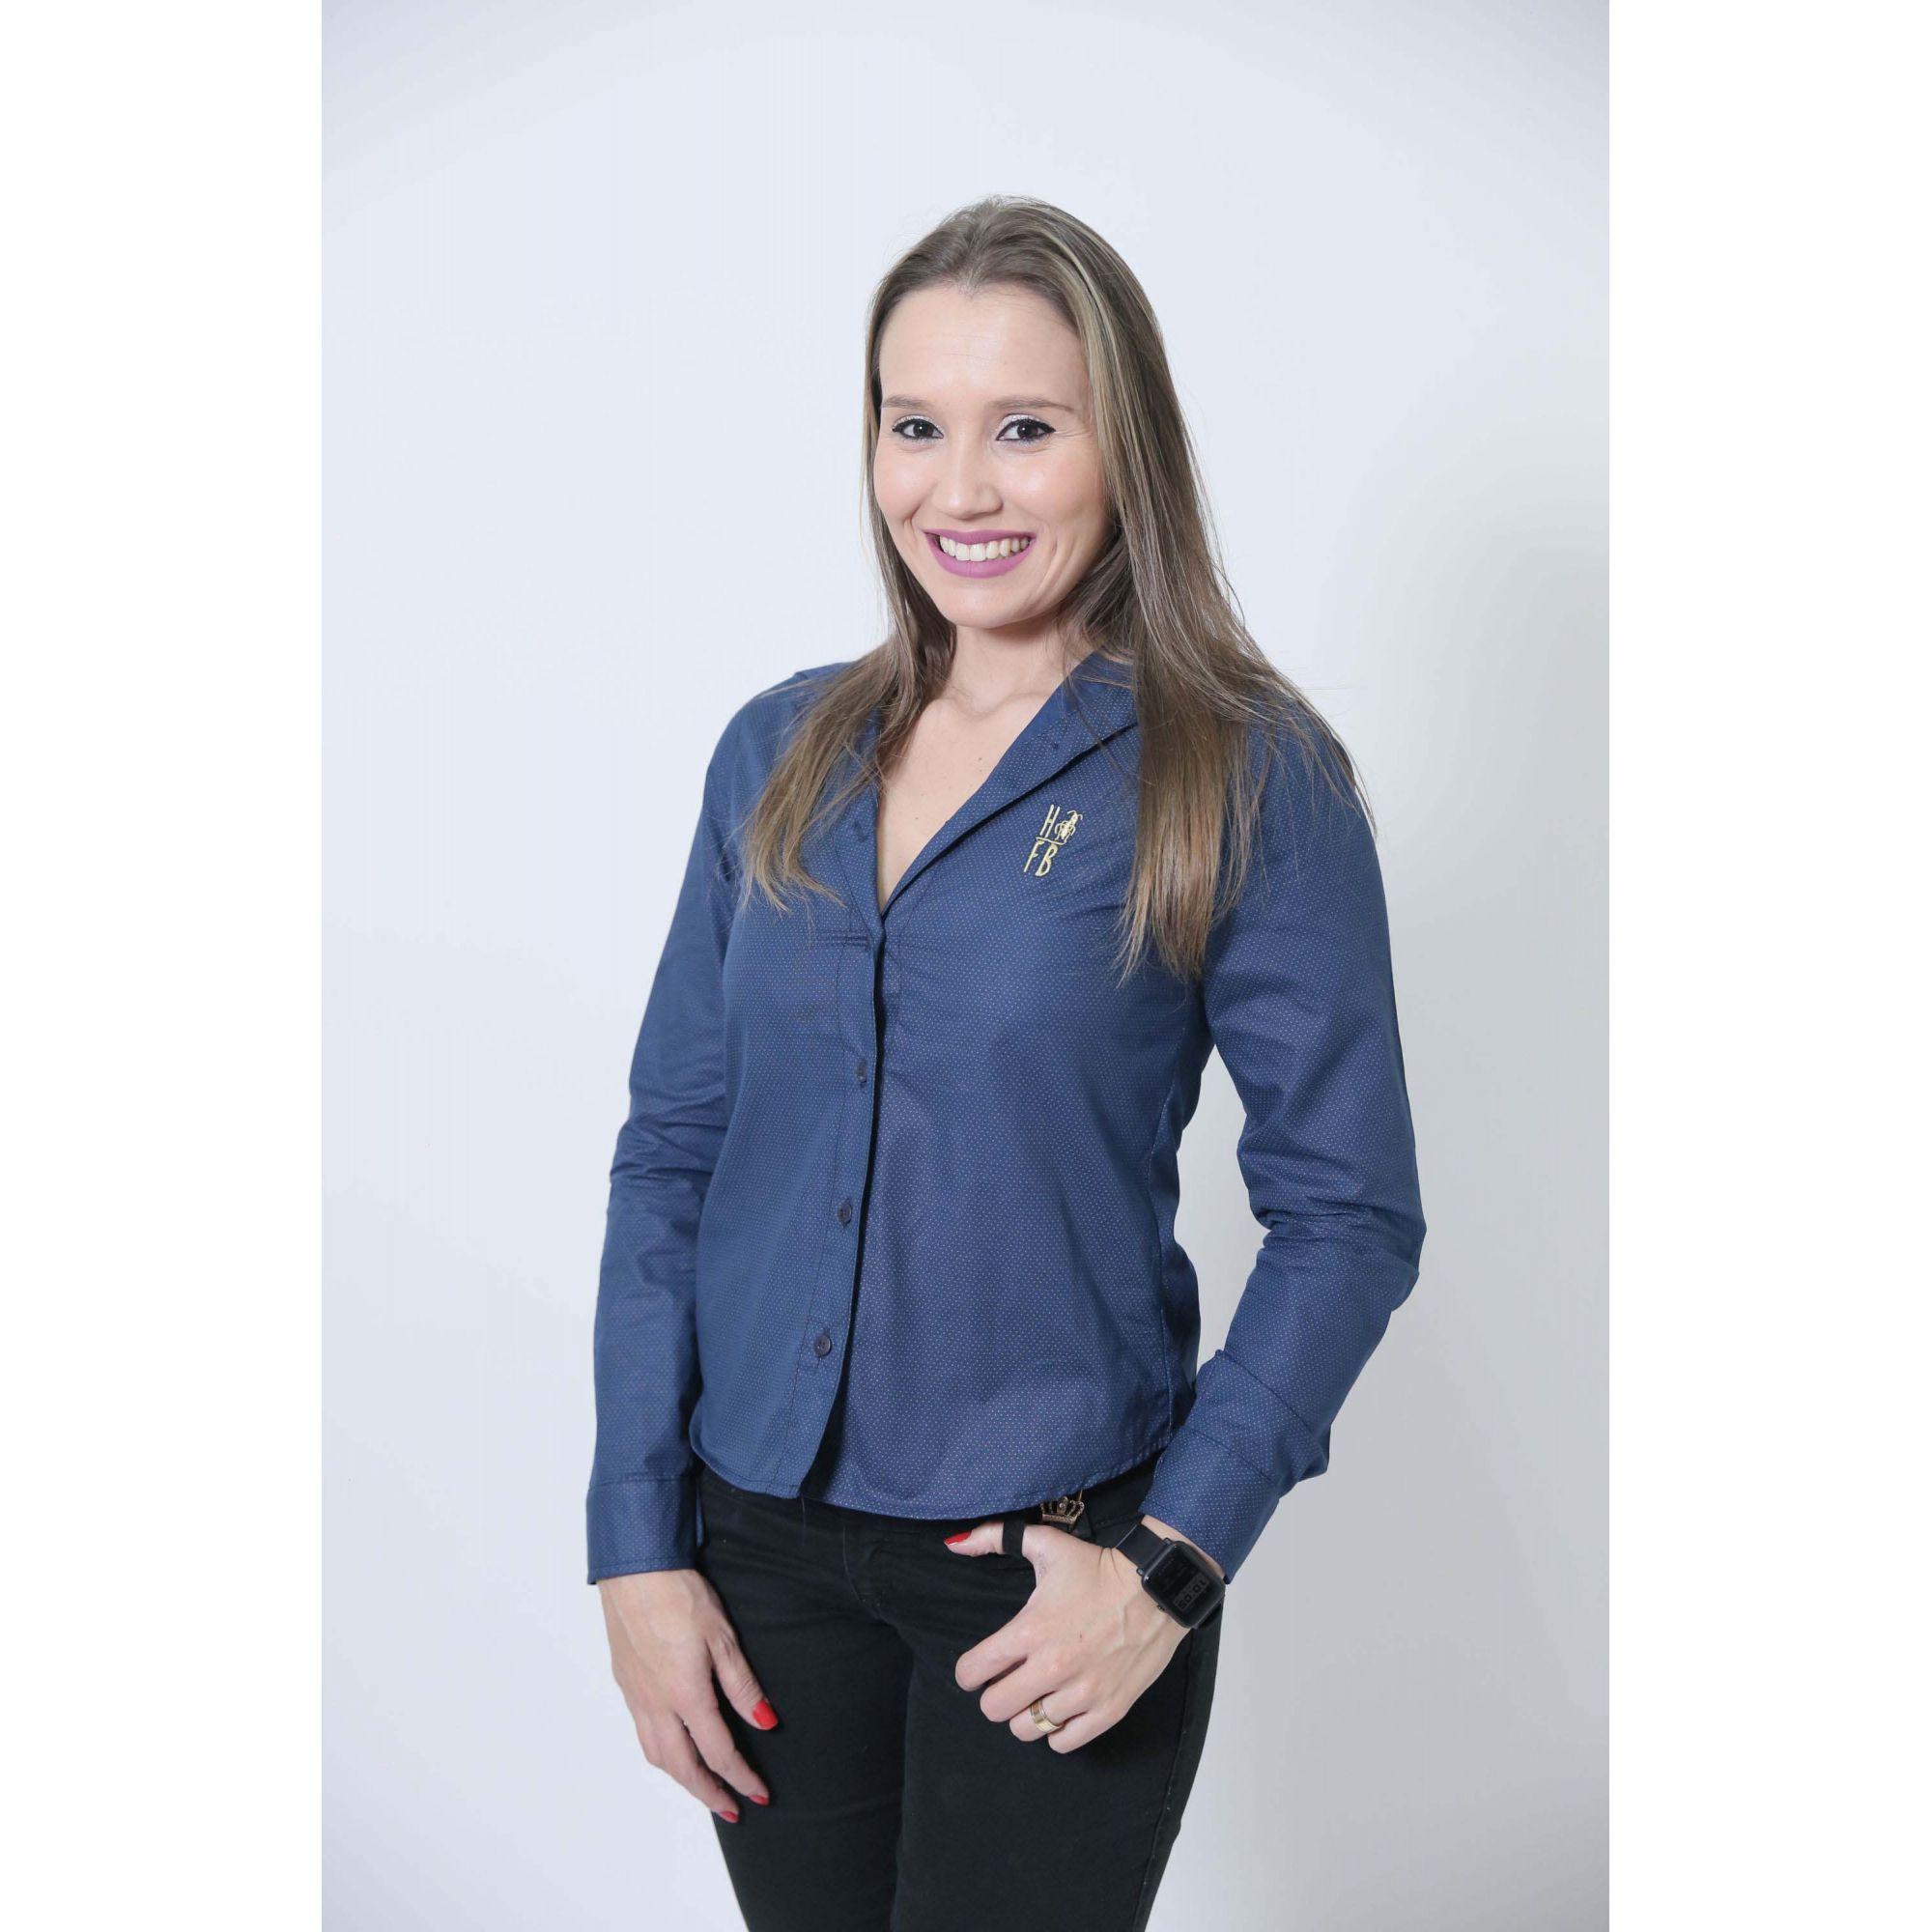 Camisa Social Steven Seagal Azul Marinho Feminina  - Heitor Fashion Brazil